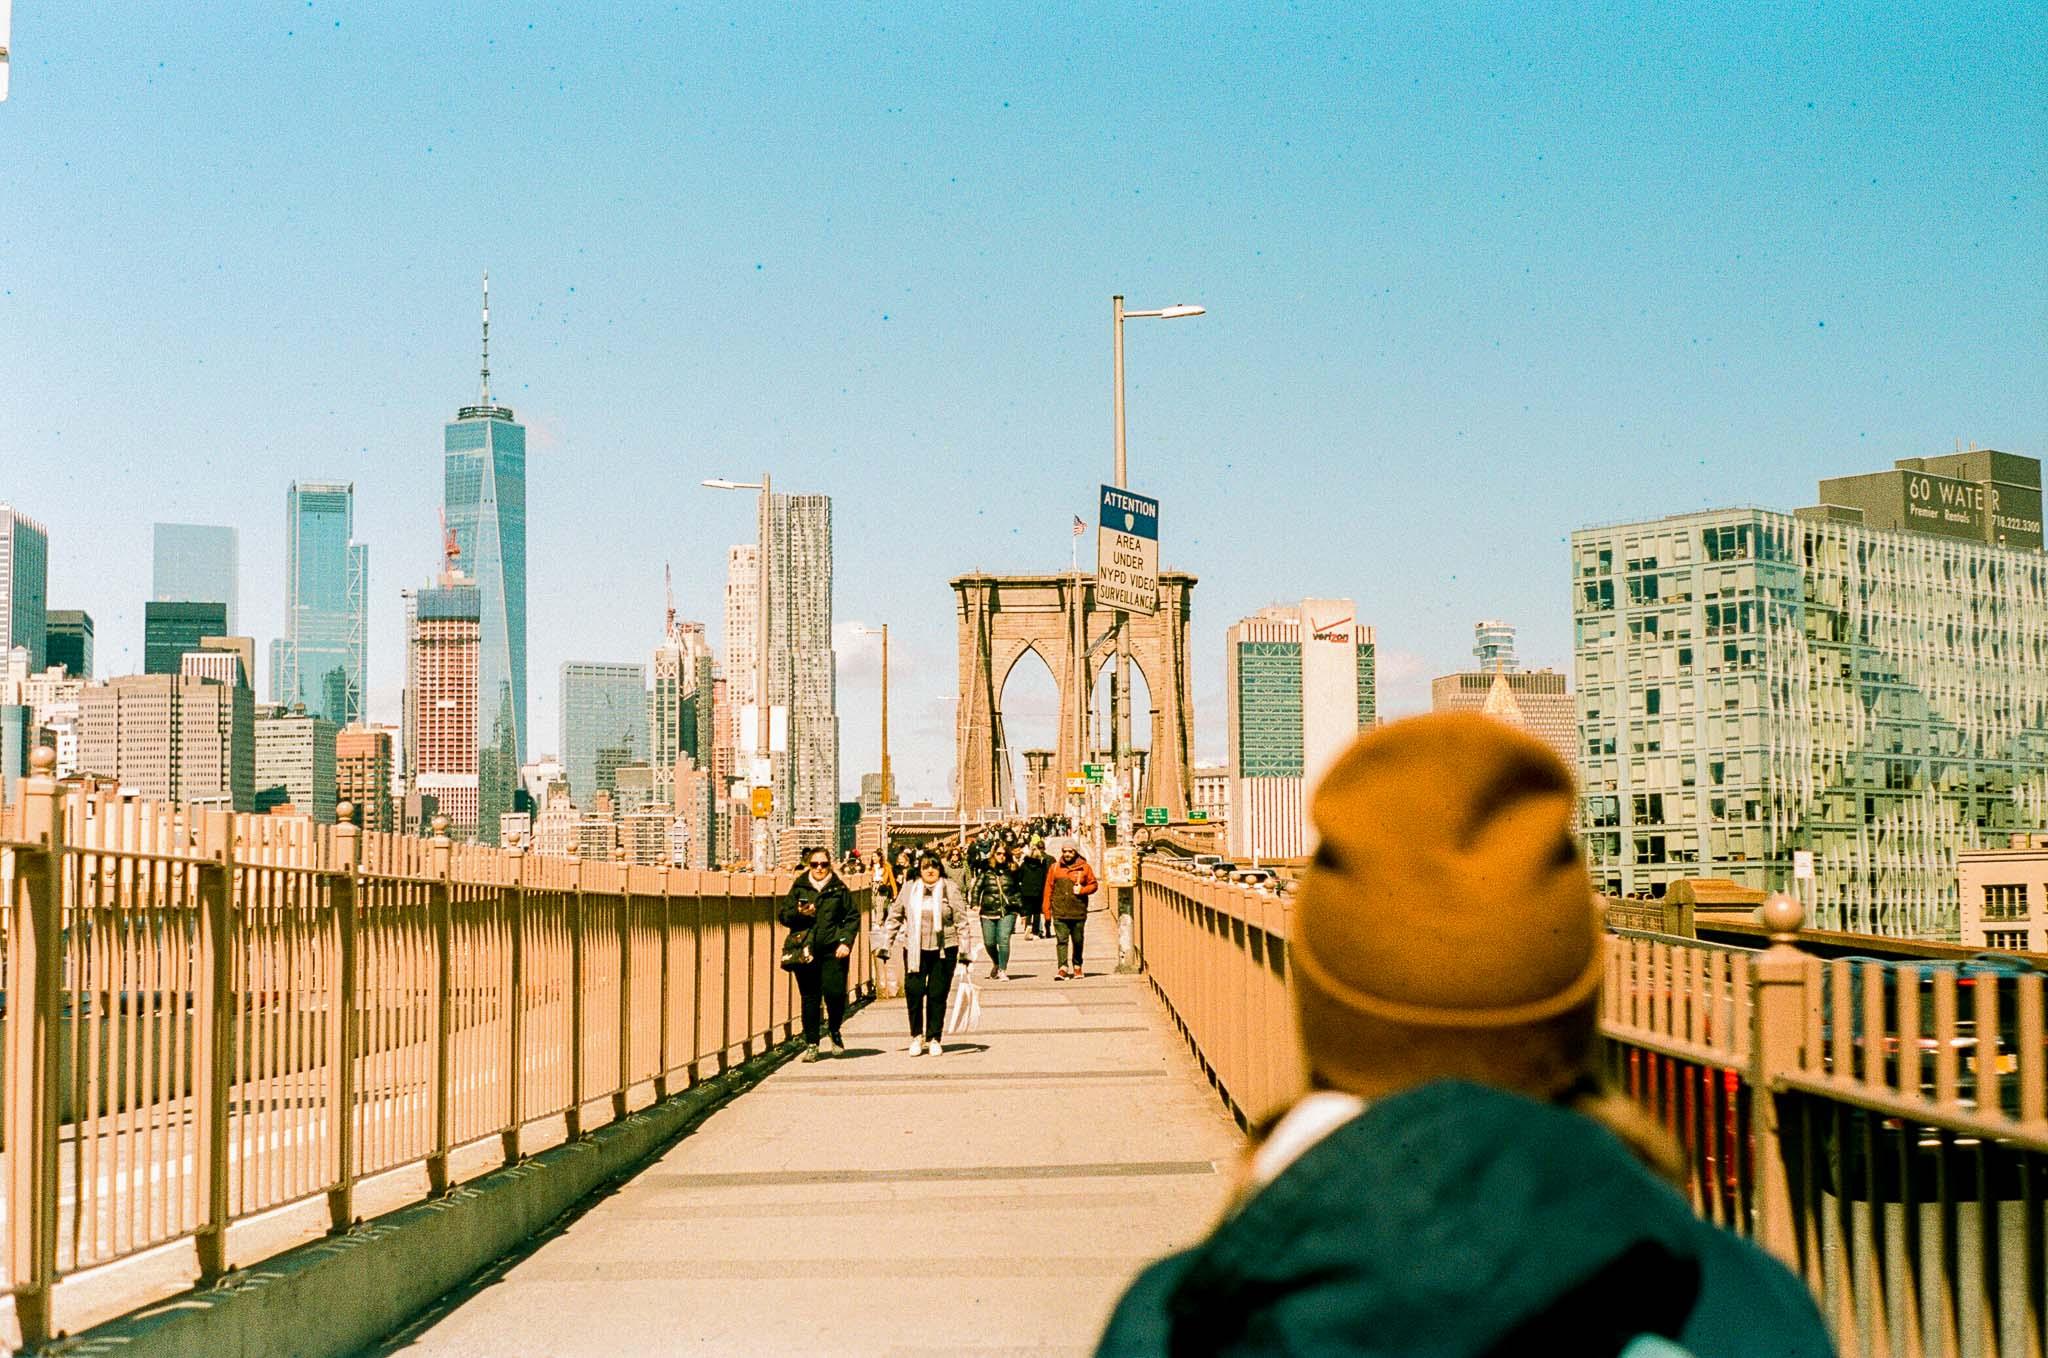 Brooklyn-Bridge-Pedestrian-Walkway.jpg